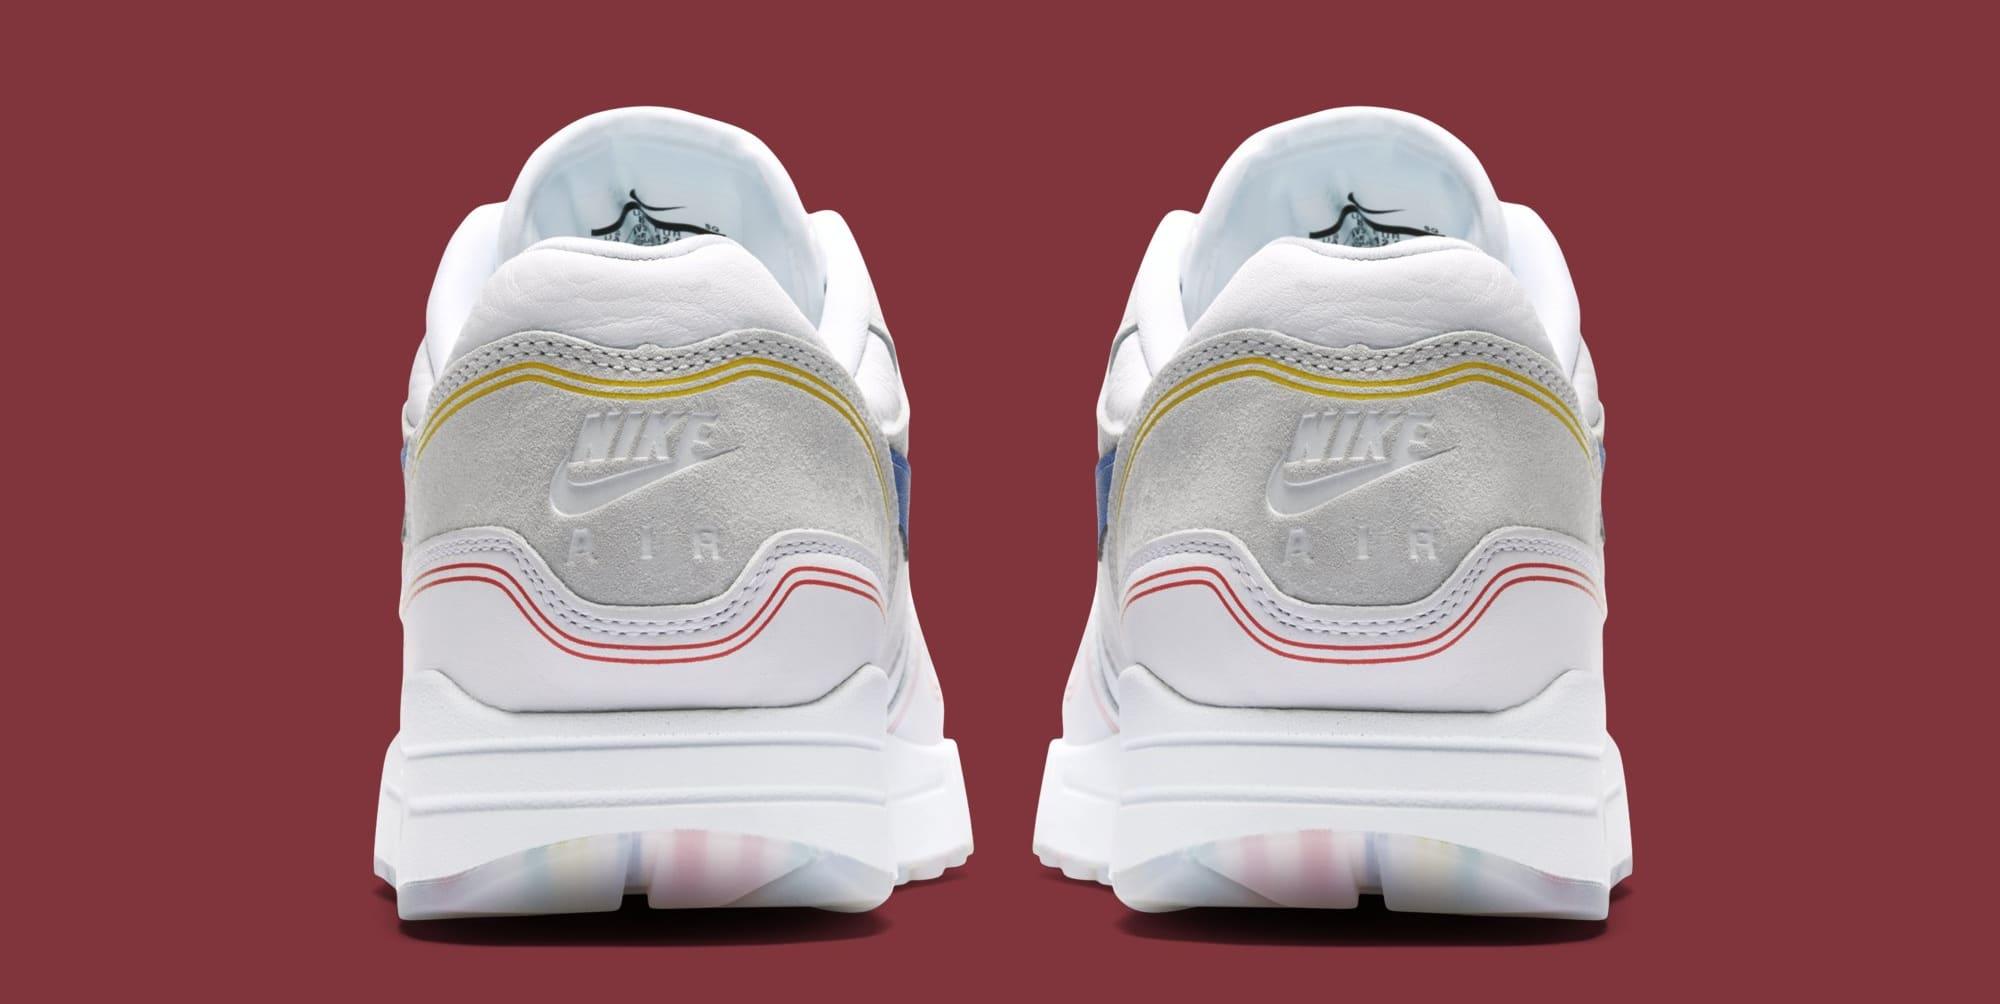 new product c9f81 00795 Image via Nike Nike Air Max 1  Centre Pompidou  Pure Platinum AV3735-002  (Heel)